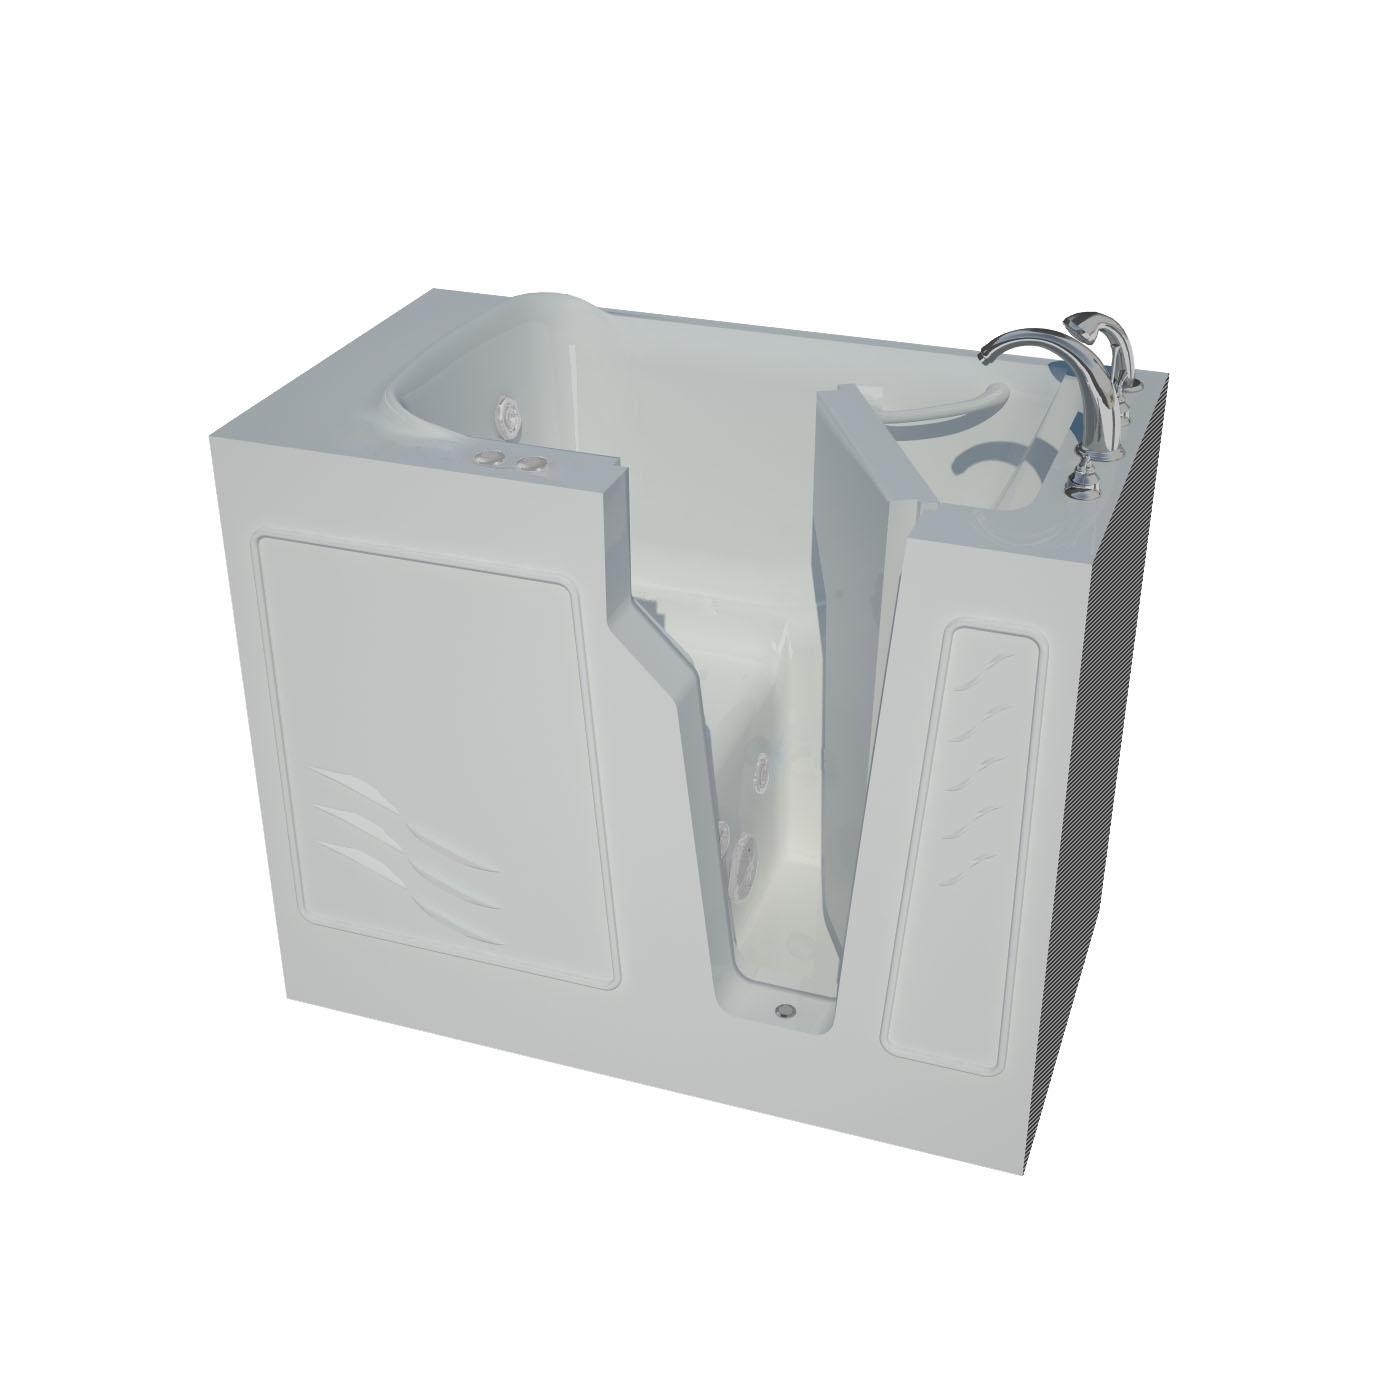 26 x 46 Right Drain Soaking Walk-In Bathtub in White